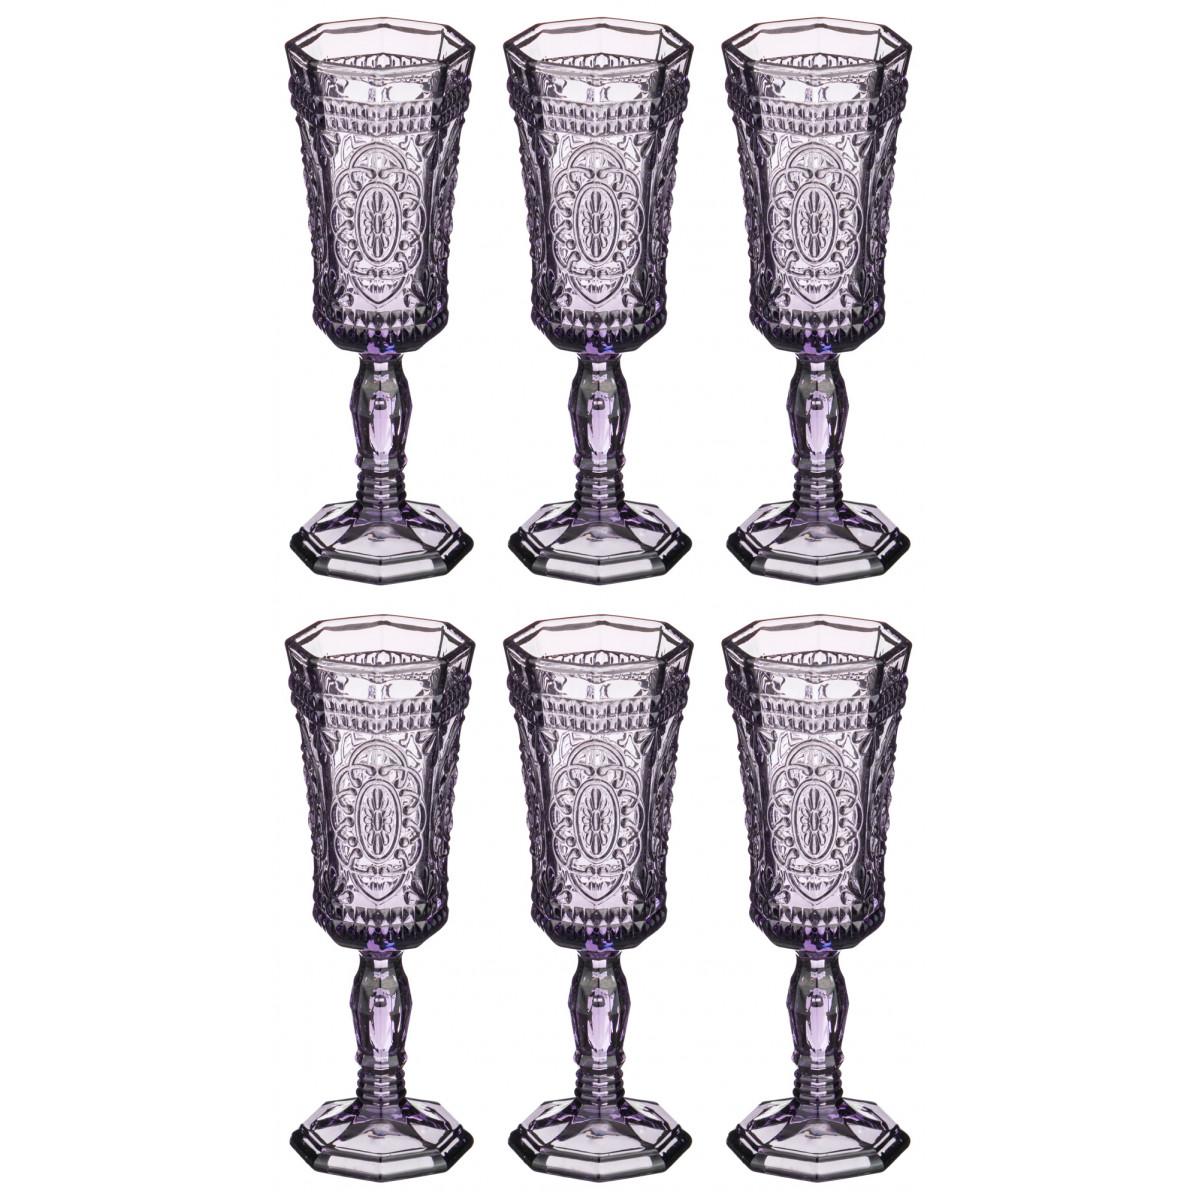 набор бокалов bistro д шампанского 2шт 275мл стекло {} MUZA Набор бокалов для шампанского Cooper  (19 см - 6 шт)